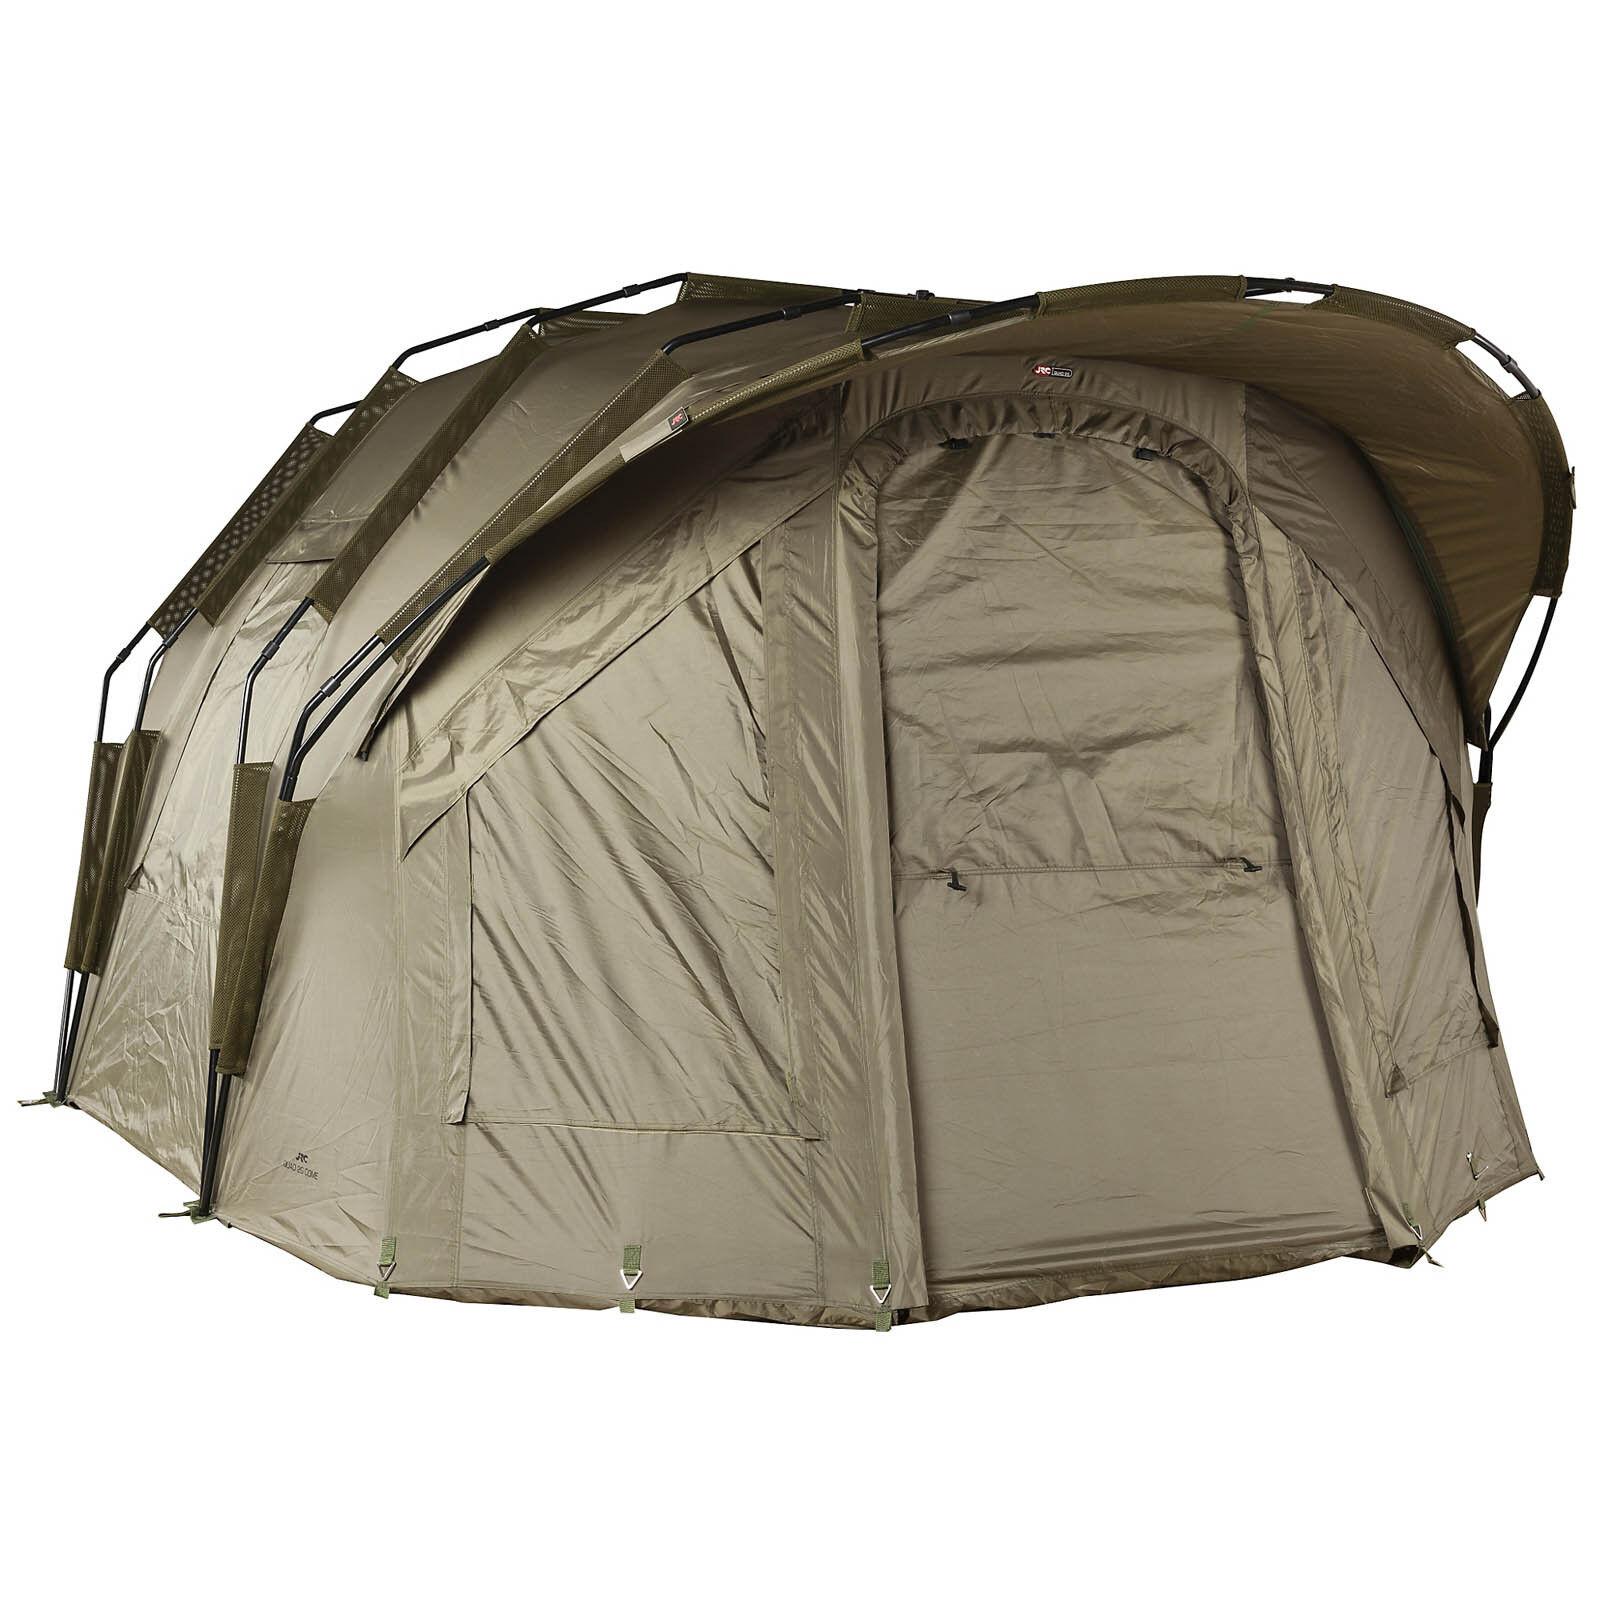 JRC Fishing Quad 2G Dome - Ultra Light & Strong, Nylon Carry Bag, Heavy Duty